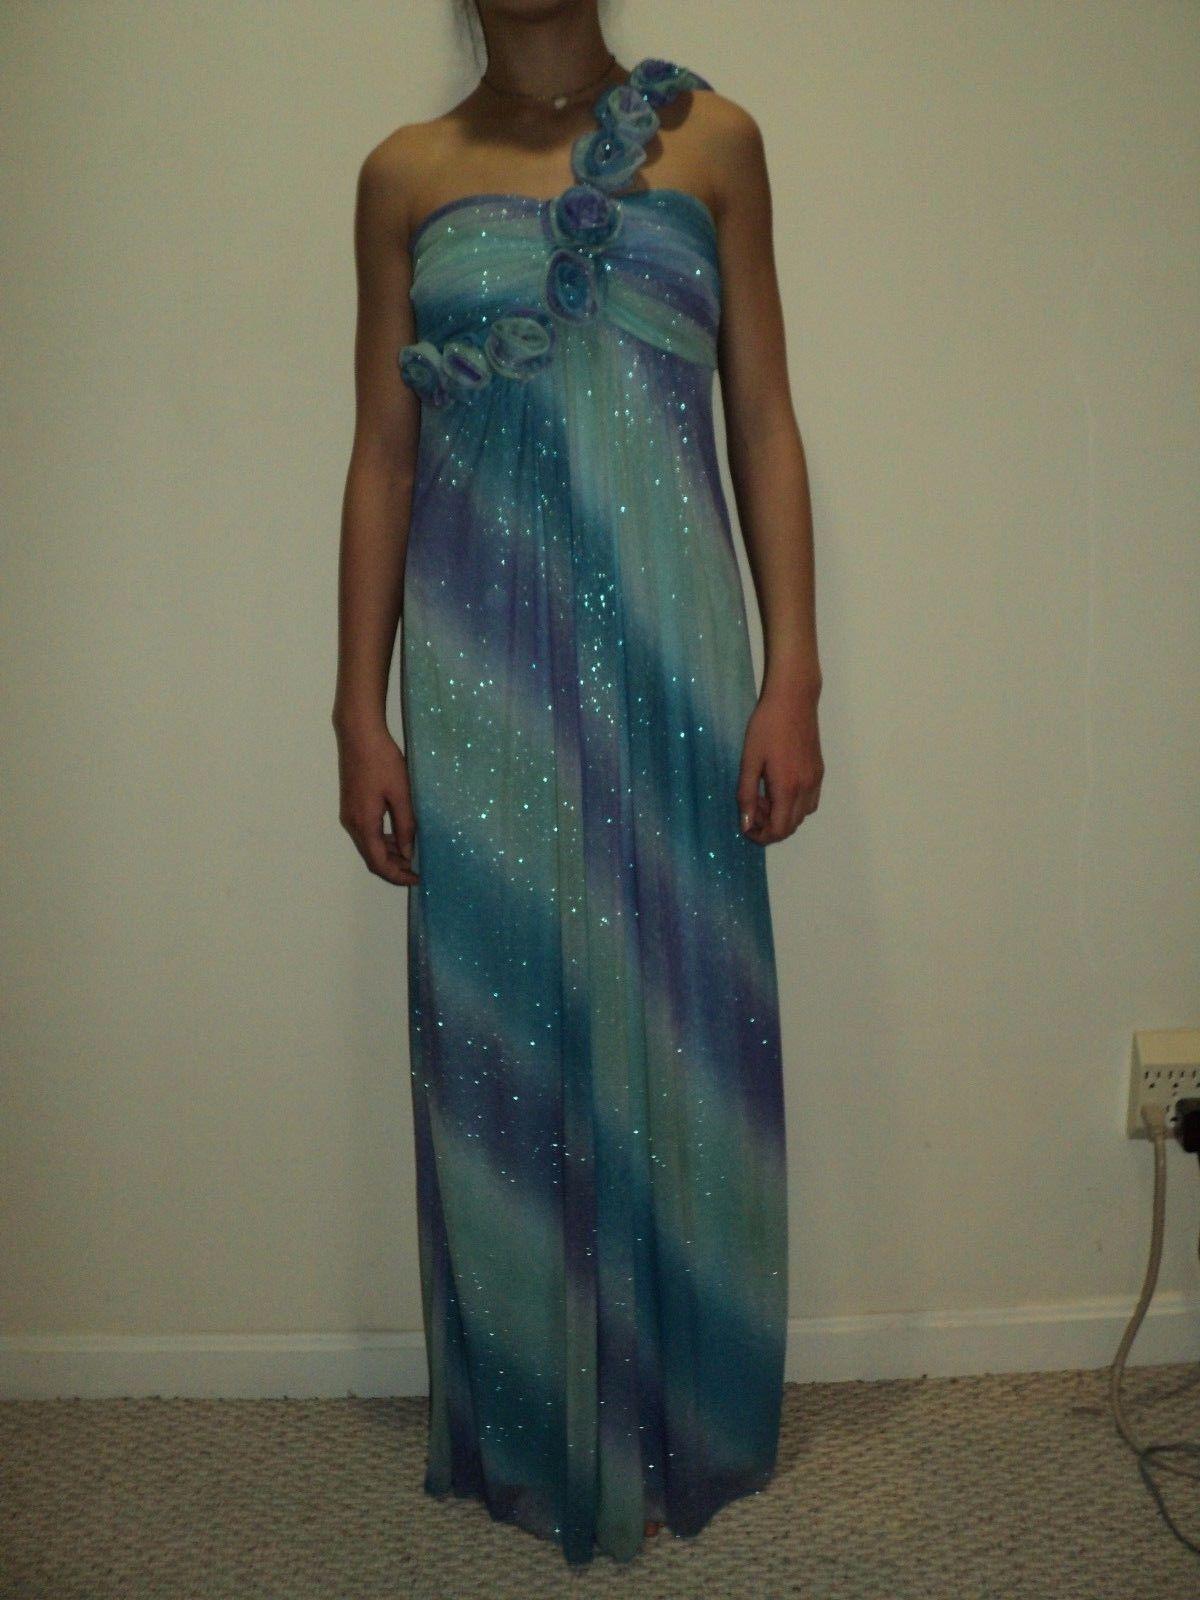 NWT WINDSOR Back Sleeveless Juniors Day Party Dress 7